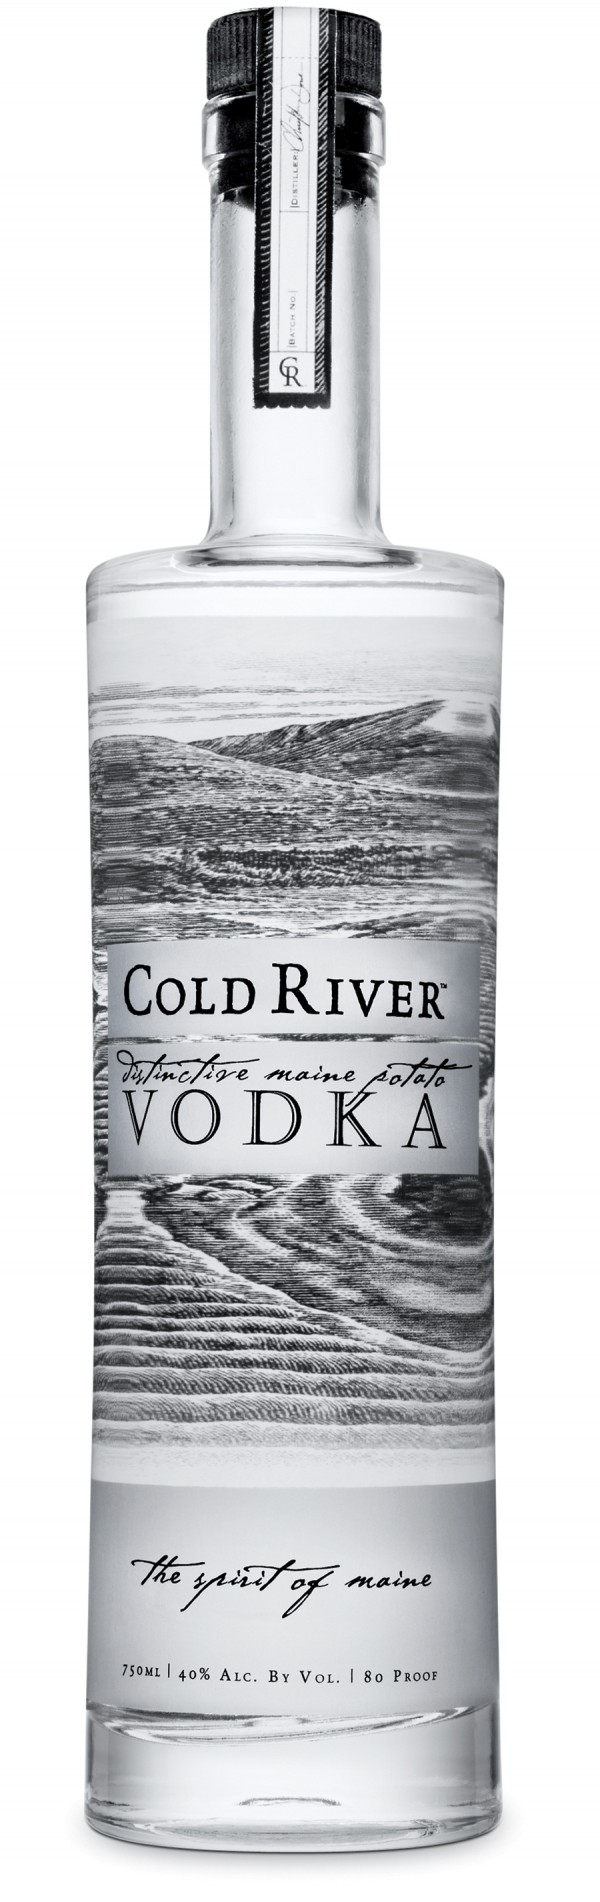 vodka713-600x1902.jpg